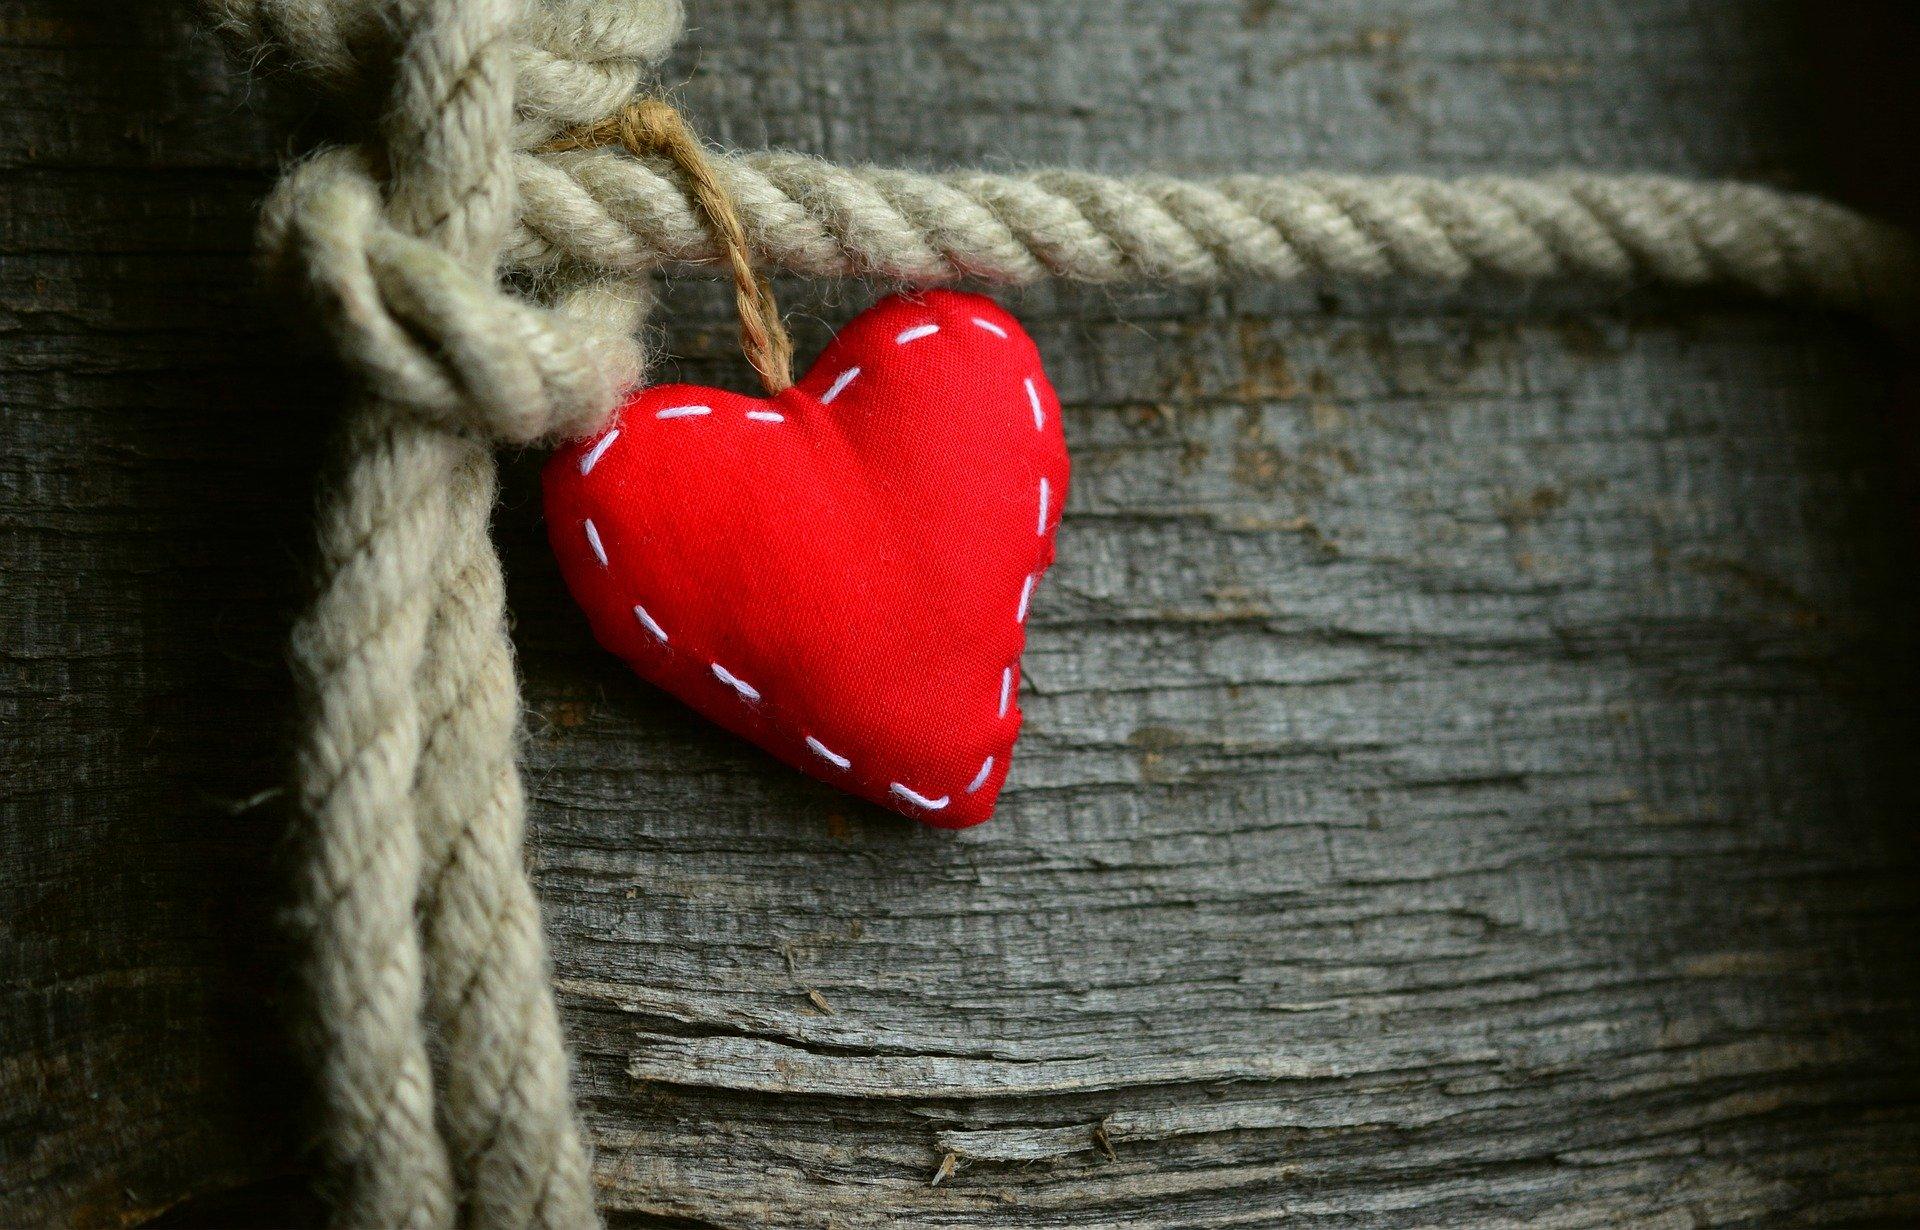 Srdce pod tlakem